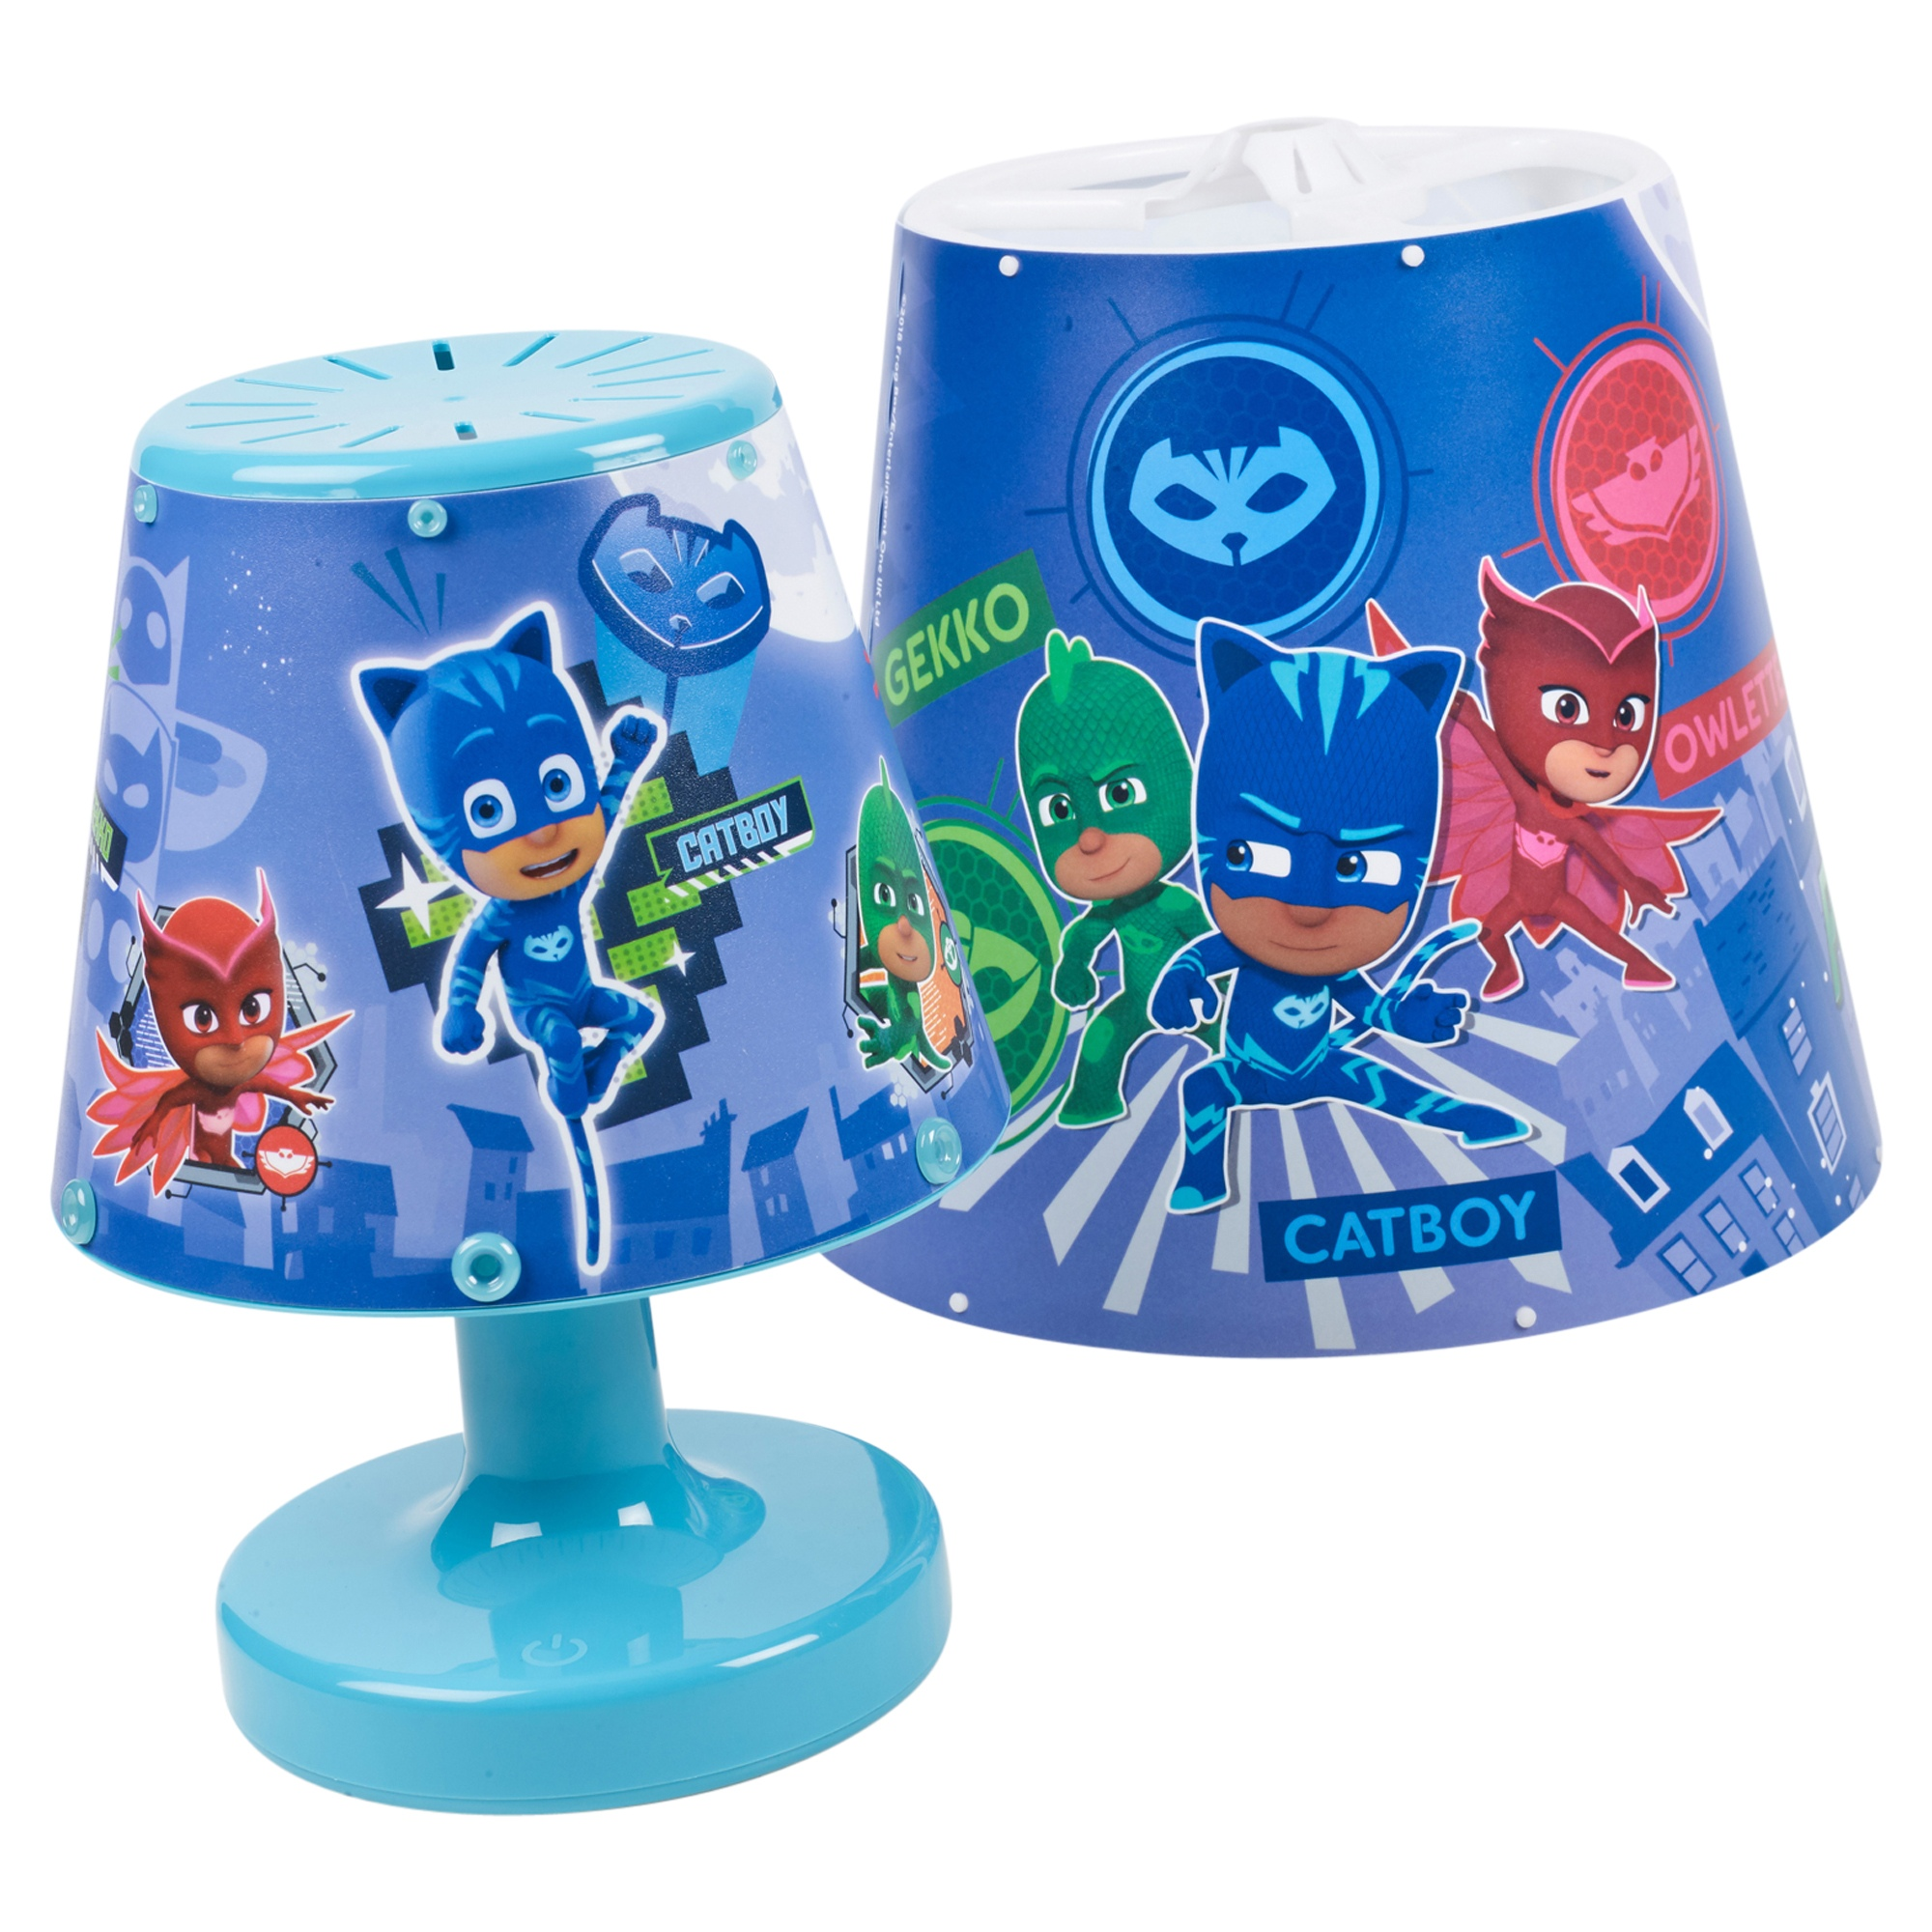 Kindermöbel Wohnen Pj Masks Tapered Ceiling Light Shade